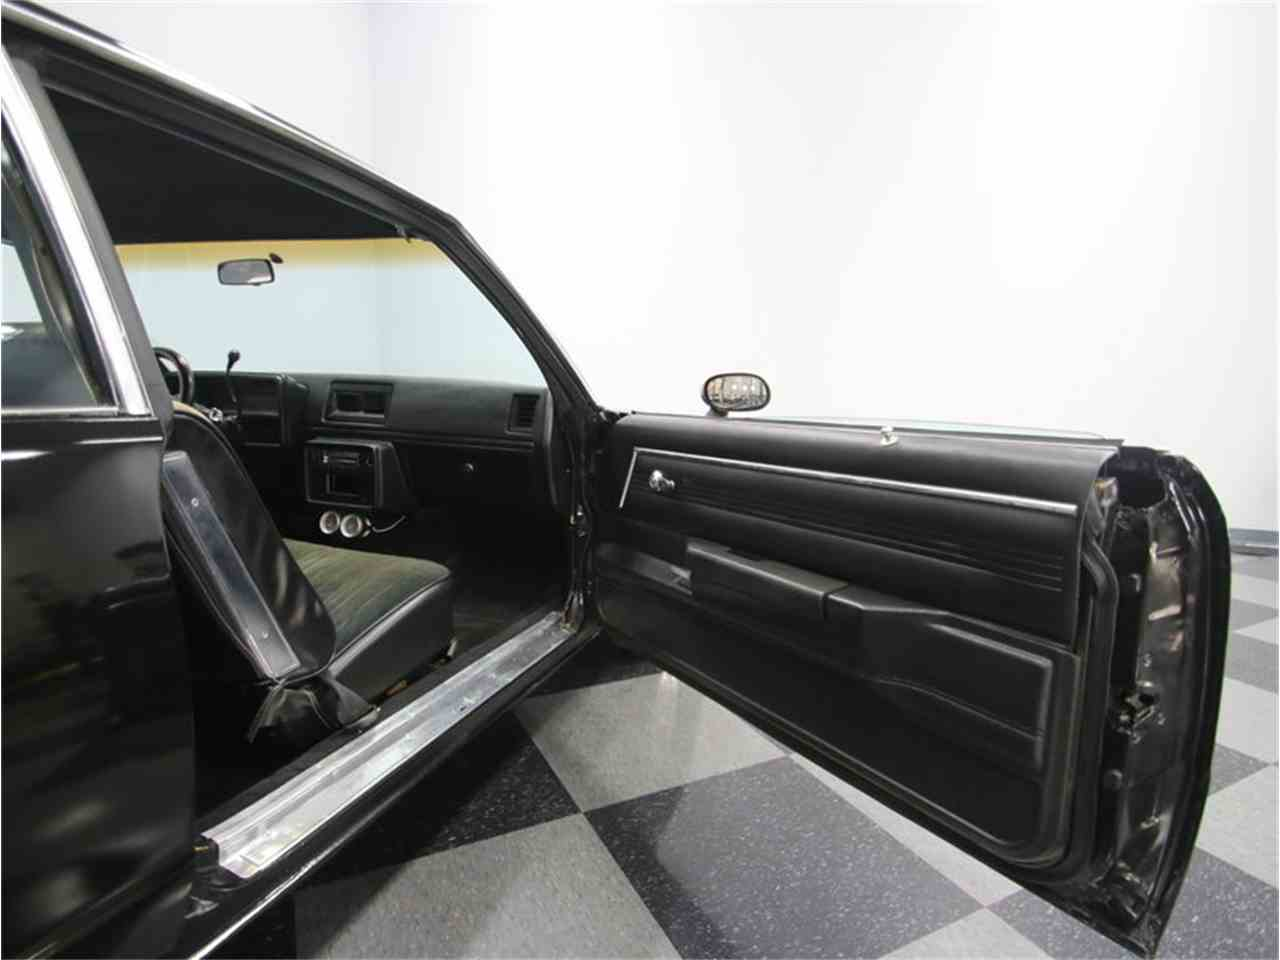 Malibu 1980 chevrolet malibu listings : 1980 Chevrolet Malibu for Sale | ClassicCars.com | CC-1006586